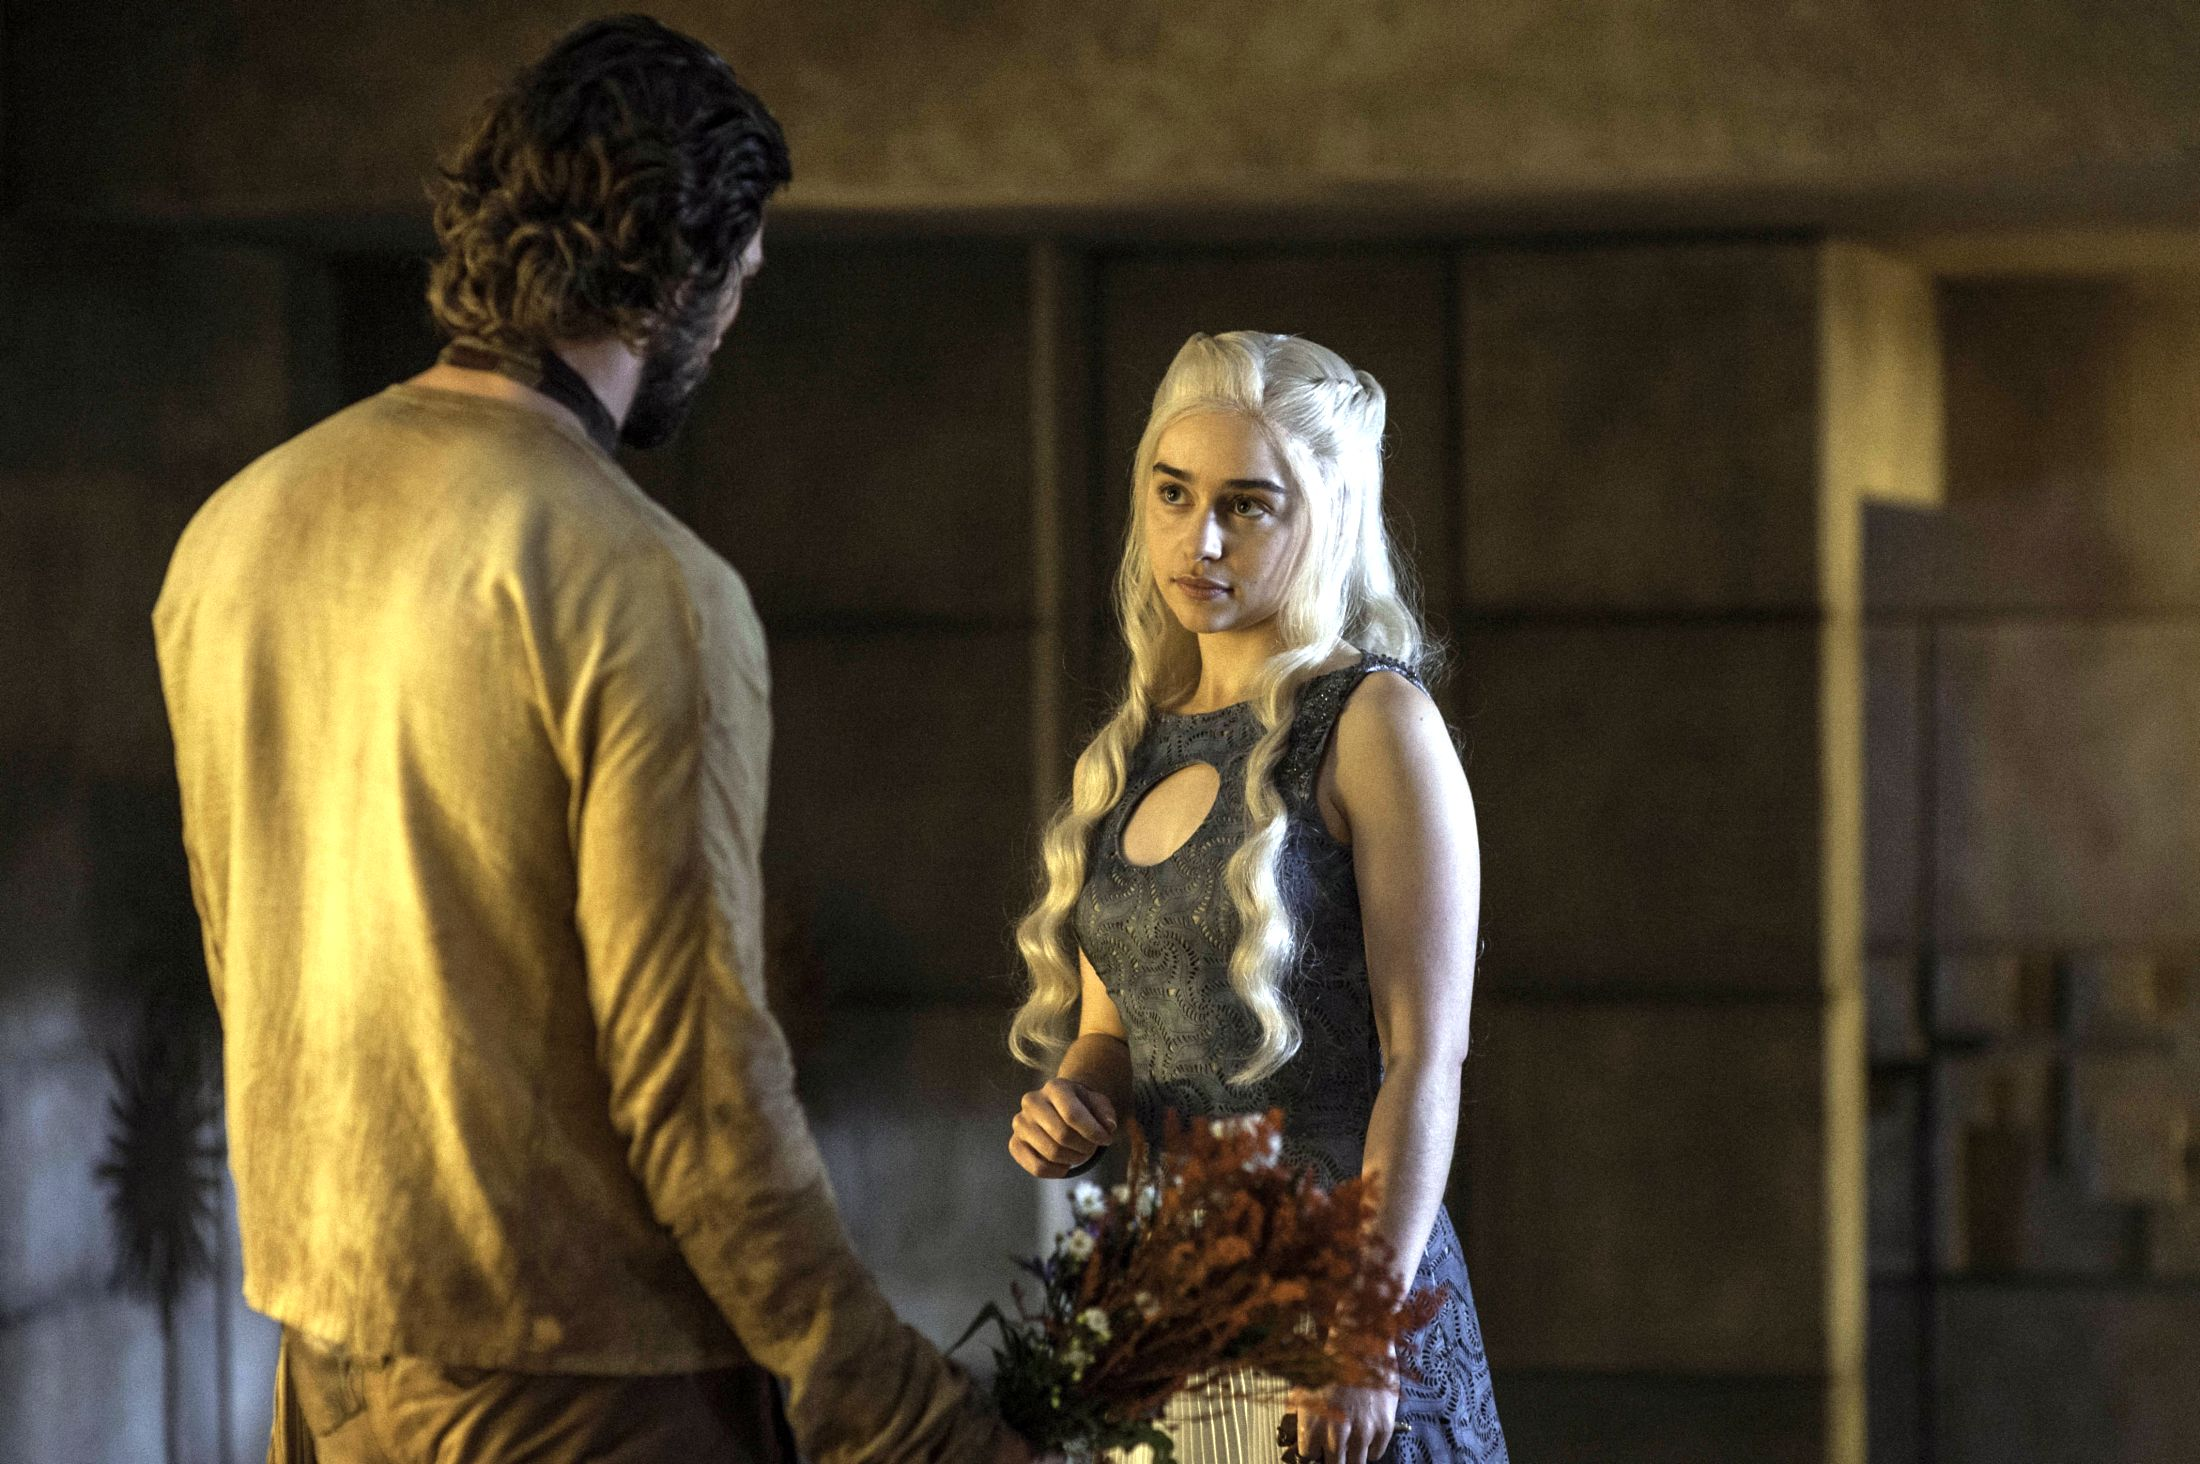 dany and daario - Daenerys Targaryen Photo (37237687) - Fanpop Daario Naharis Daenerys